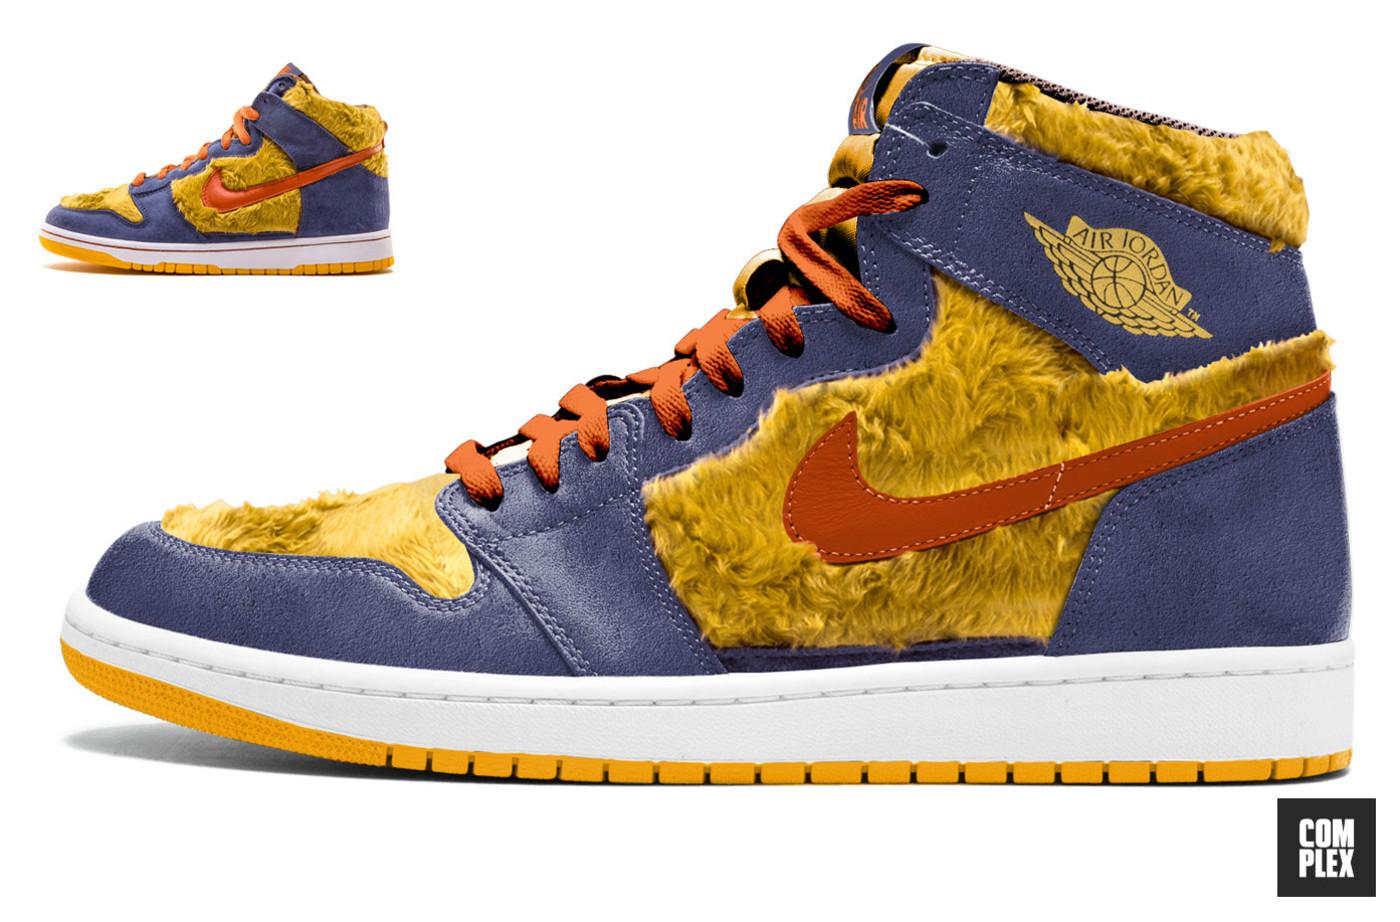 Pino alquiler Elaborar  What Nike SB x Air Jordan 1 Sneaker Collabs Could Look Like | Complex